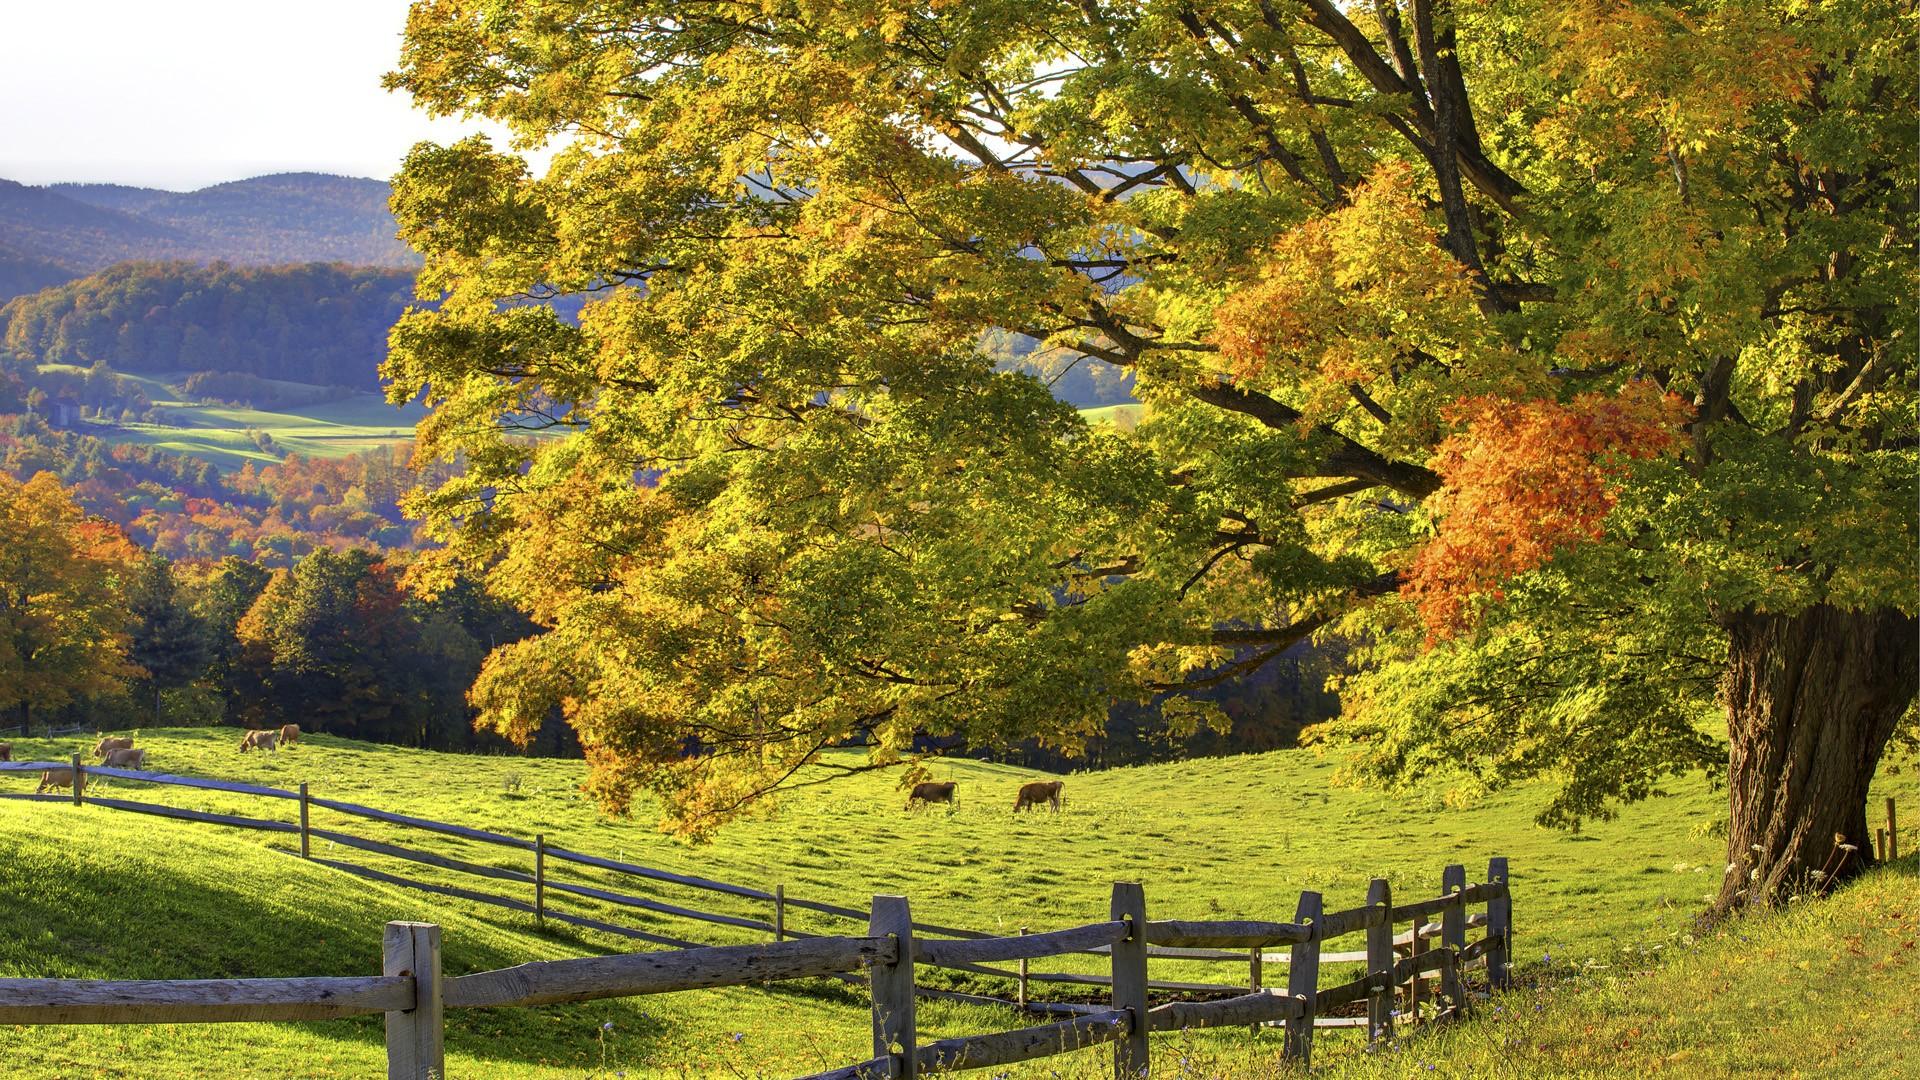 autumn wallpaper woodstock images 1920x1080